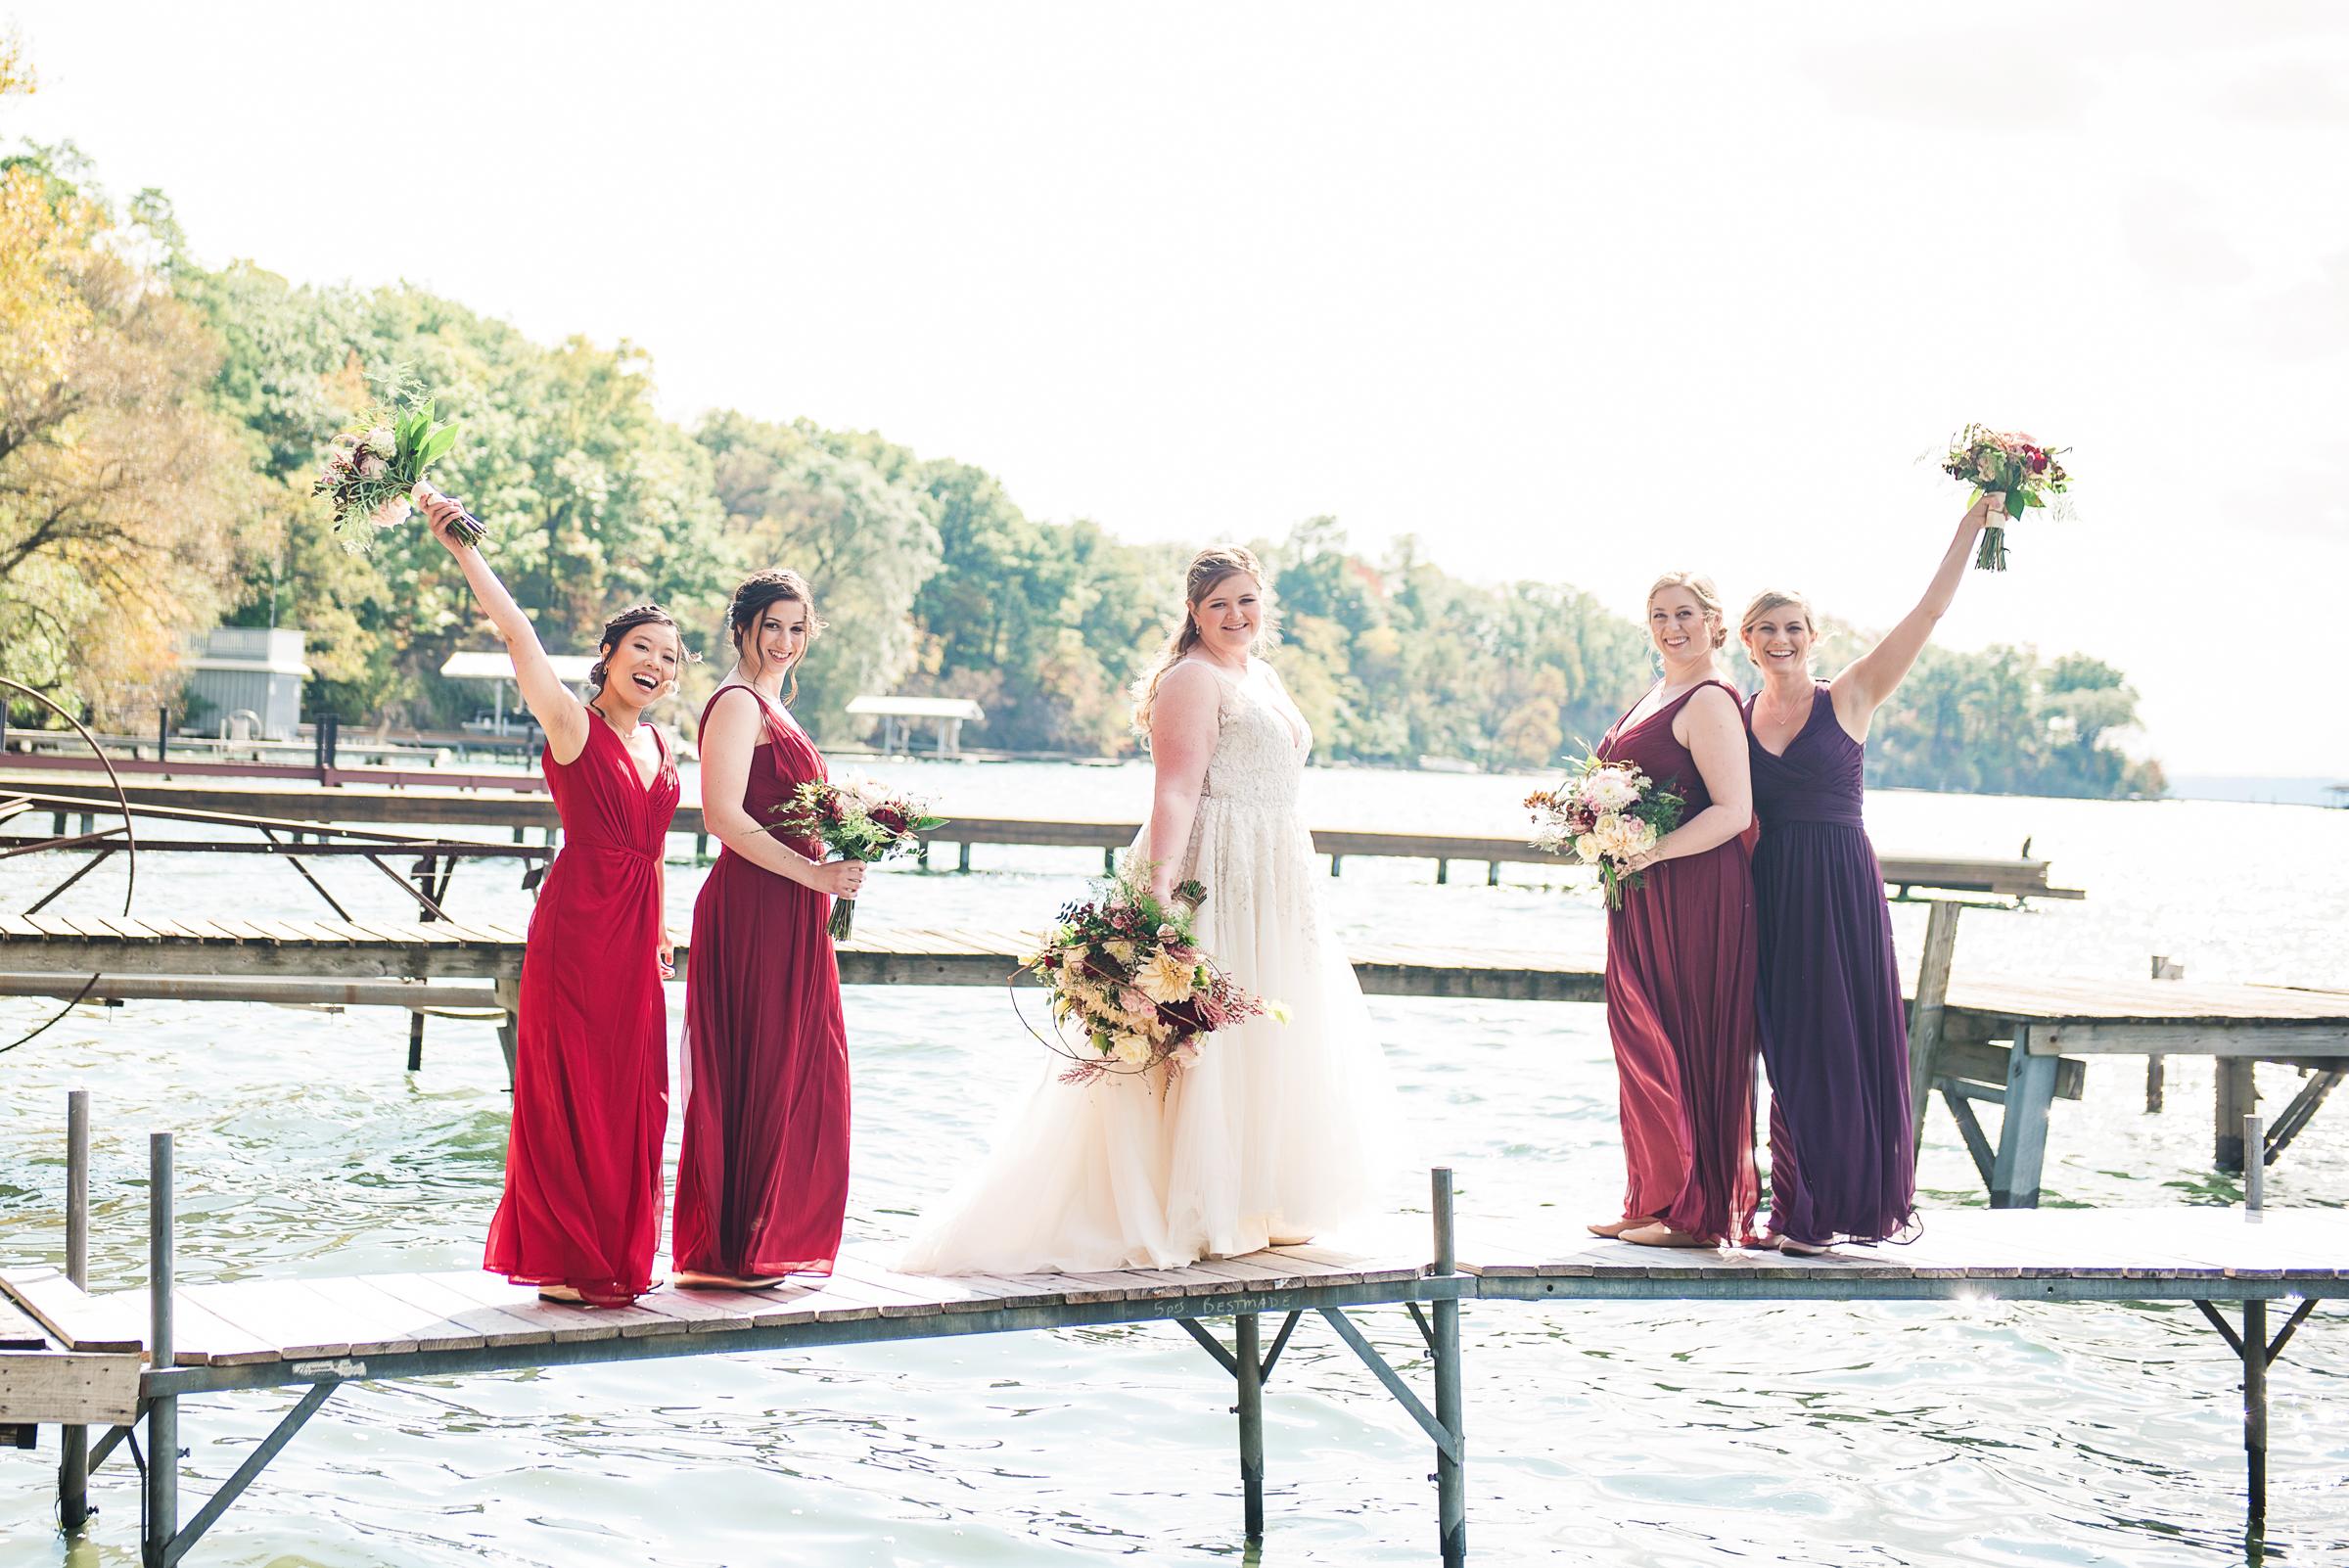 Zugibe_Vineyards_Finger_Lakes_Wedding_JILL_STUDIO_Rochester_NY_Photographer_DSC_3357.jpg